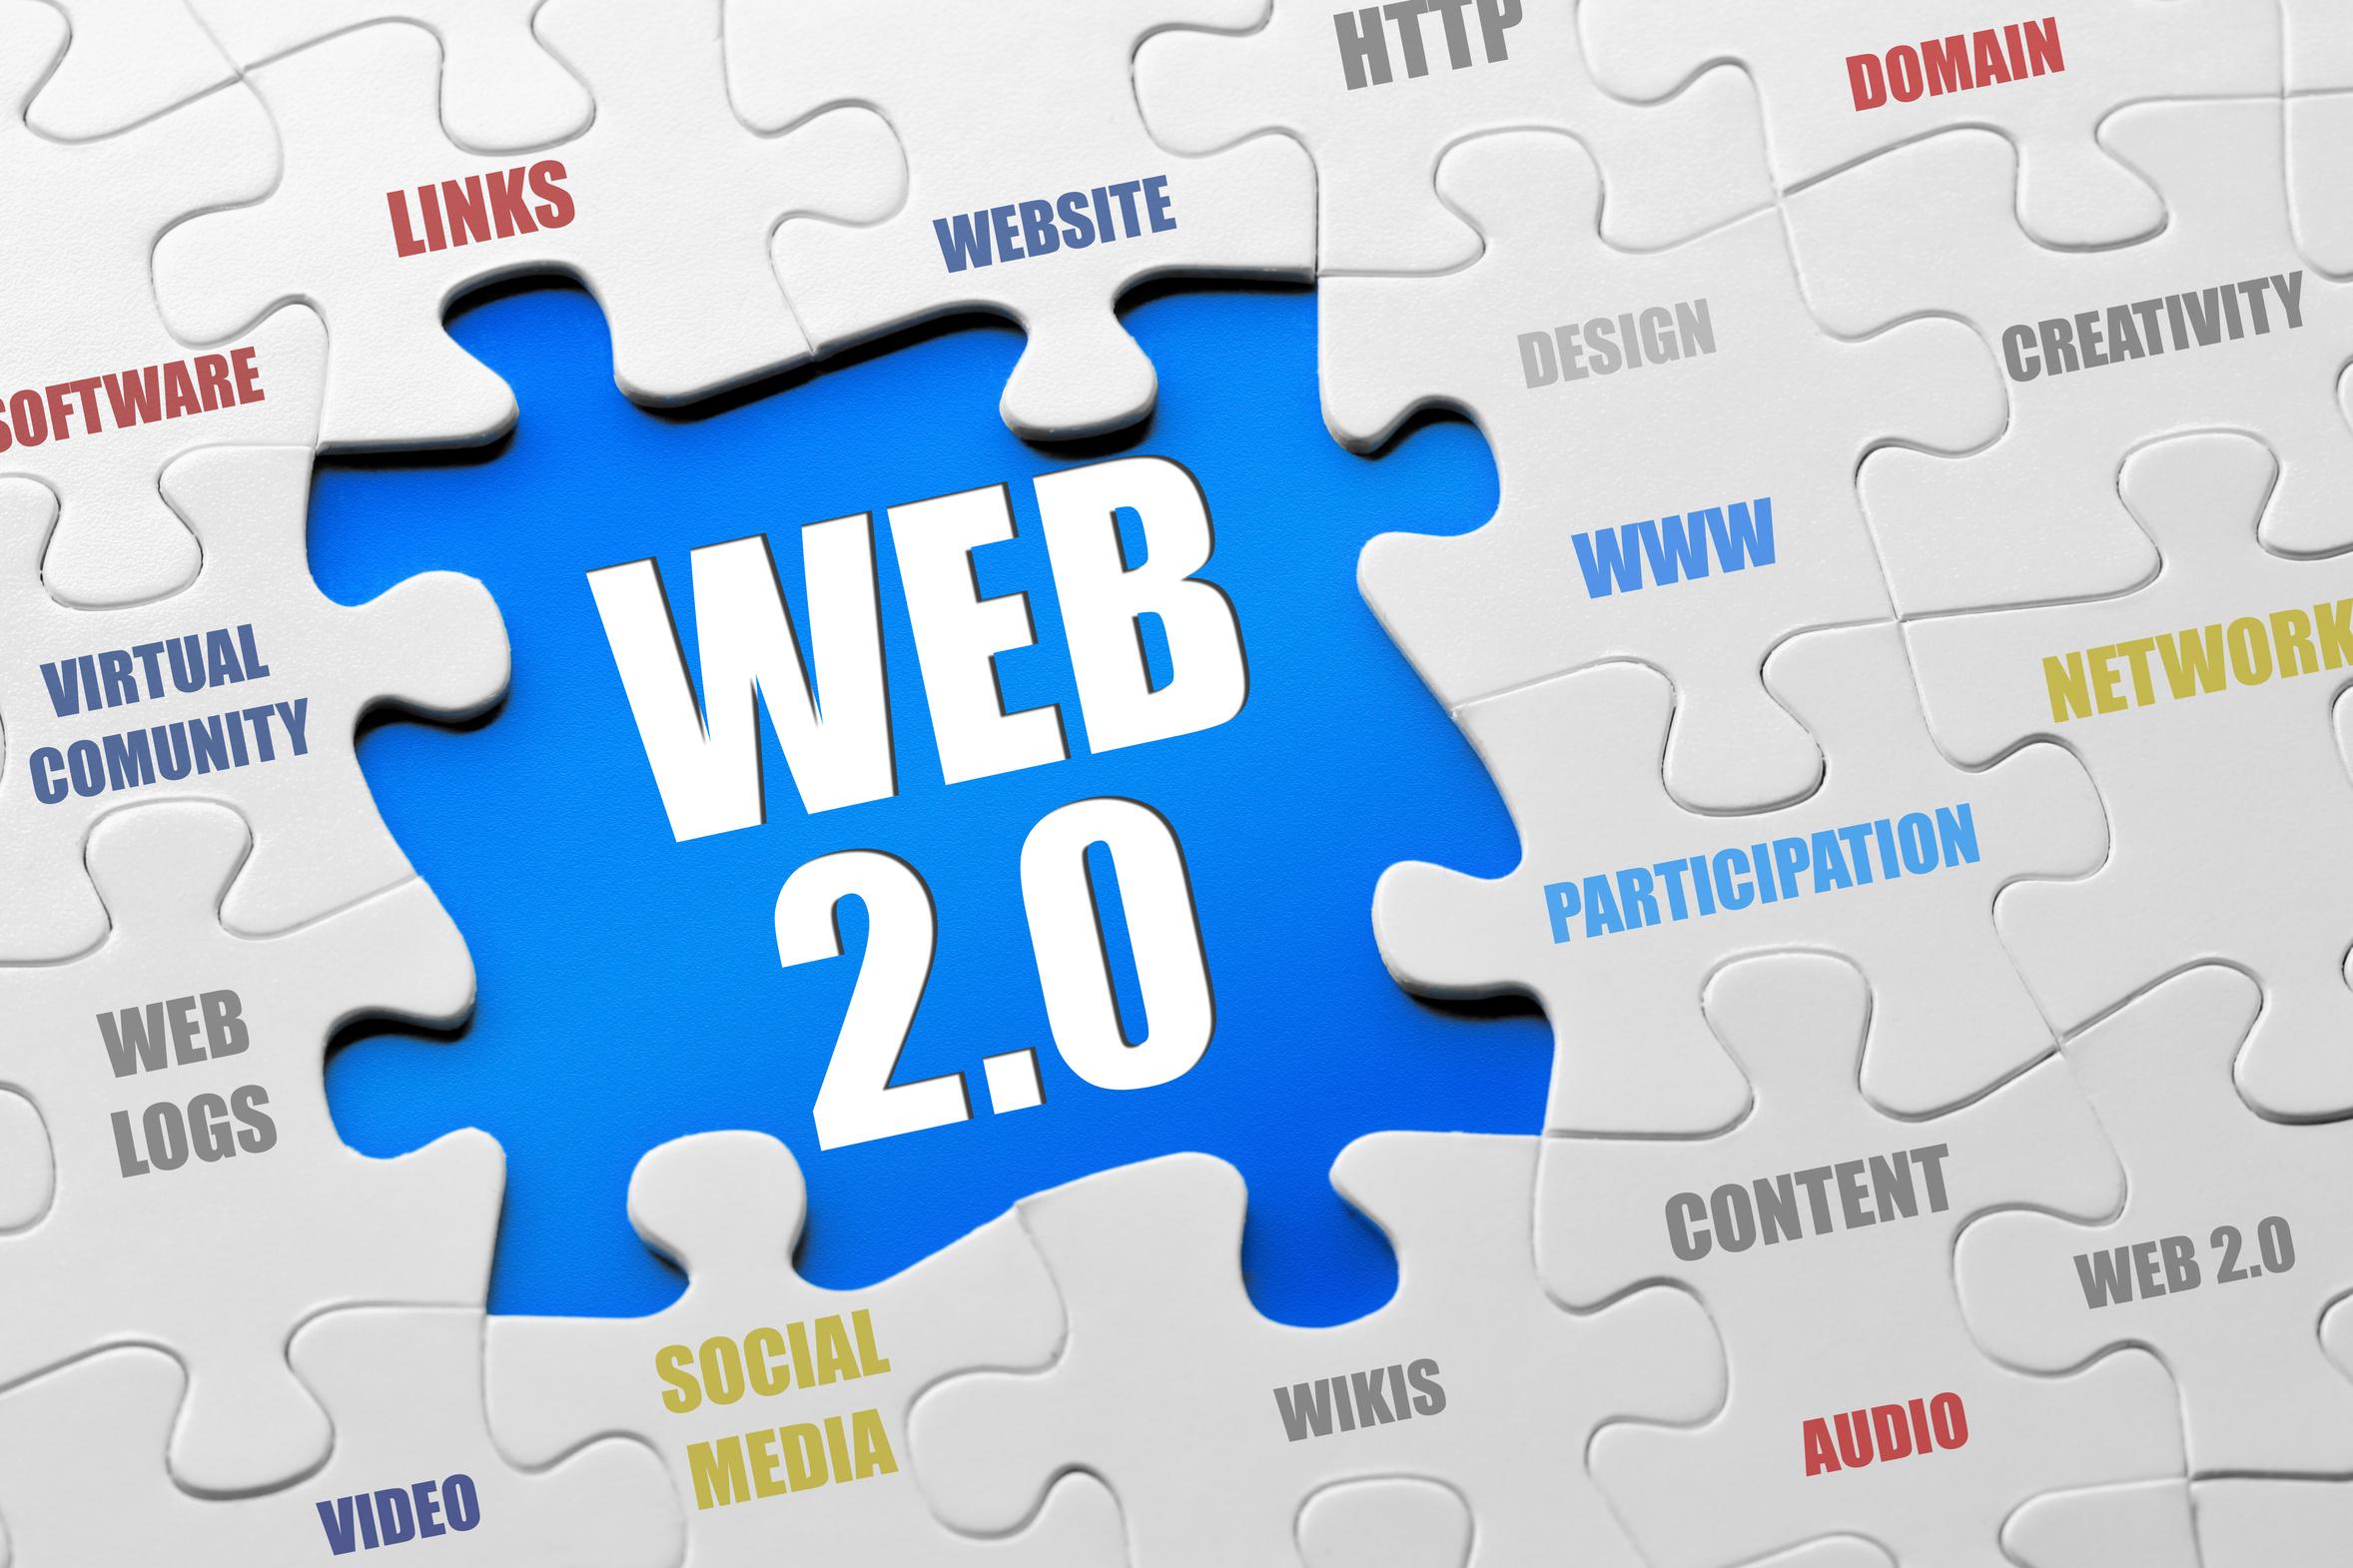 Manually create 20 High PR web 2.0 sites